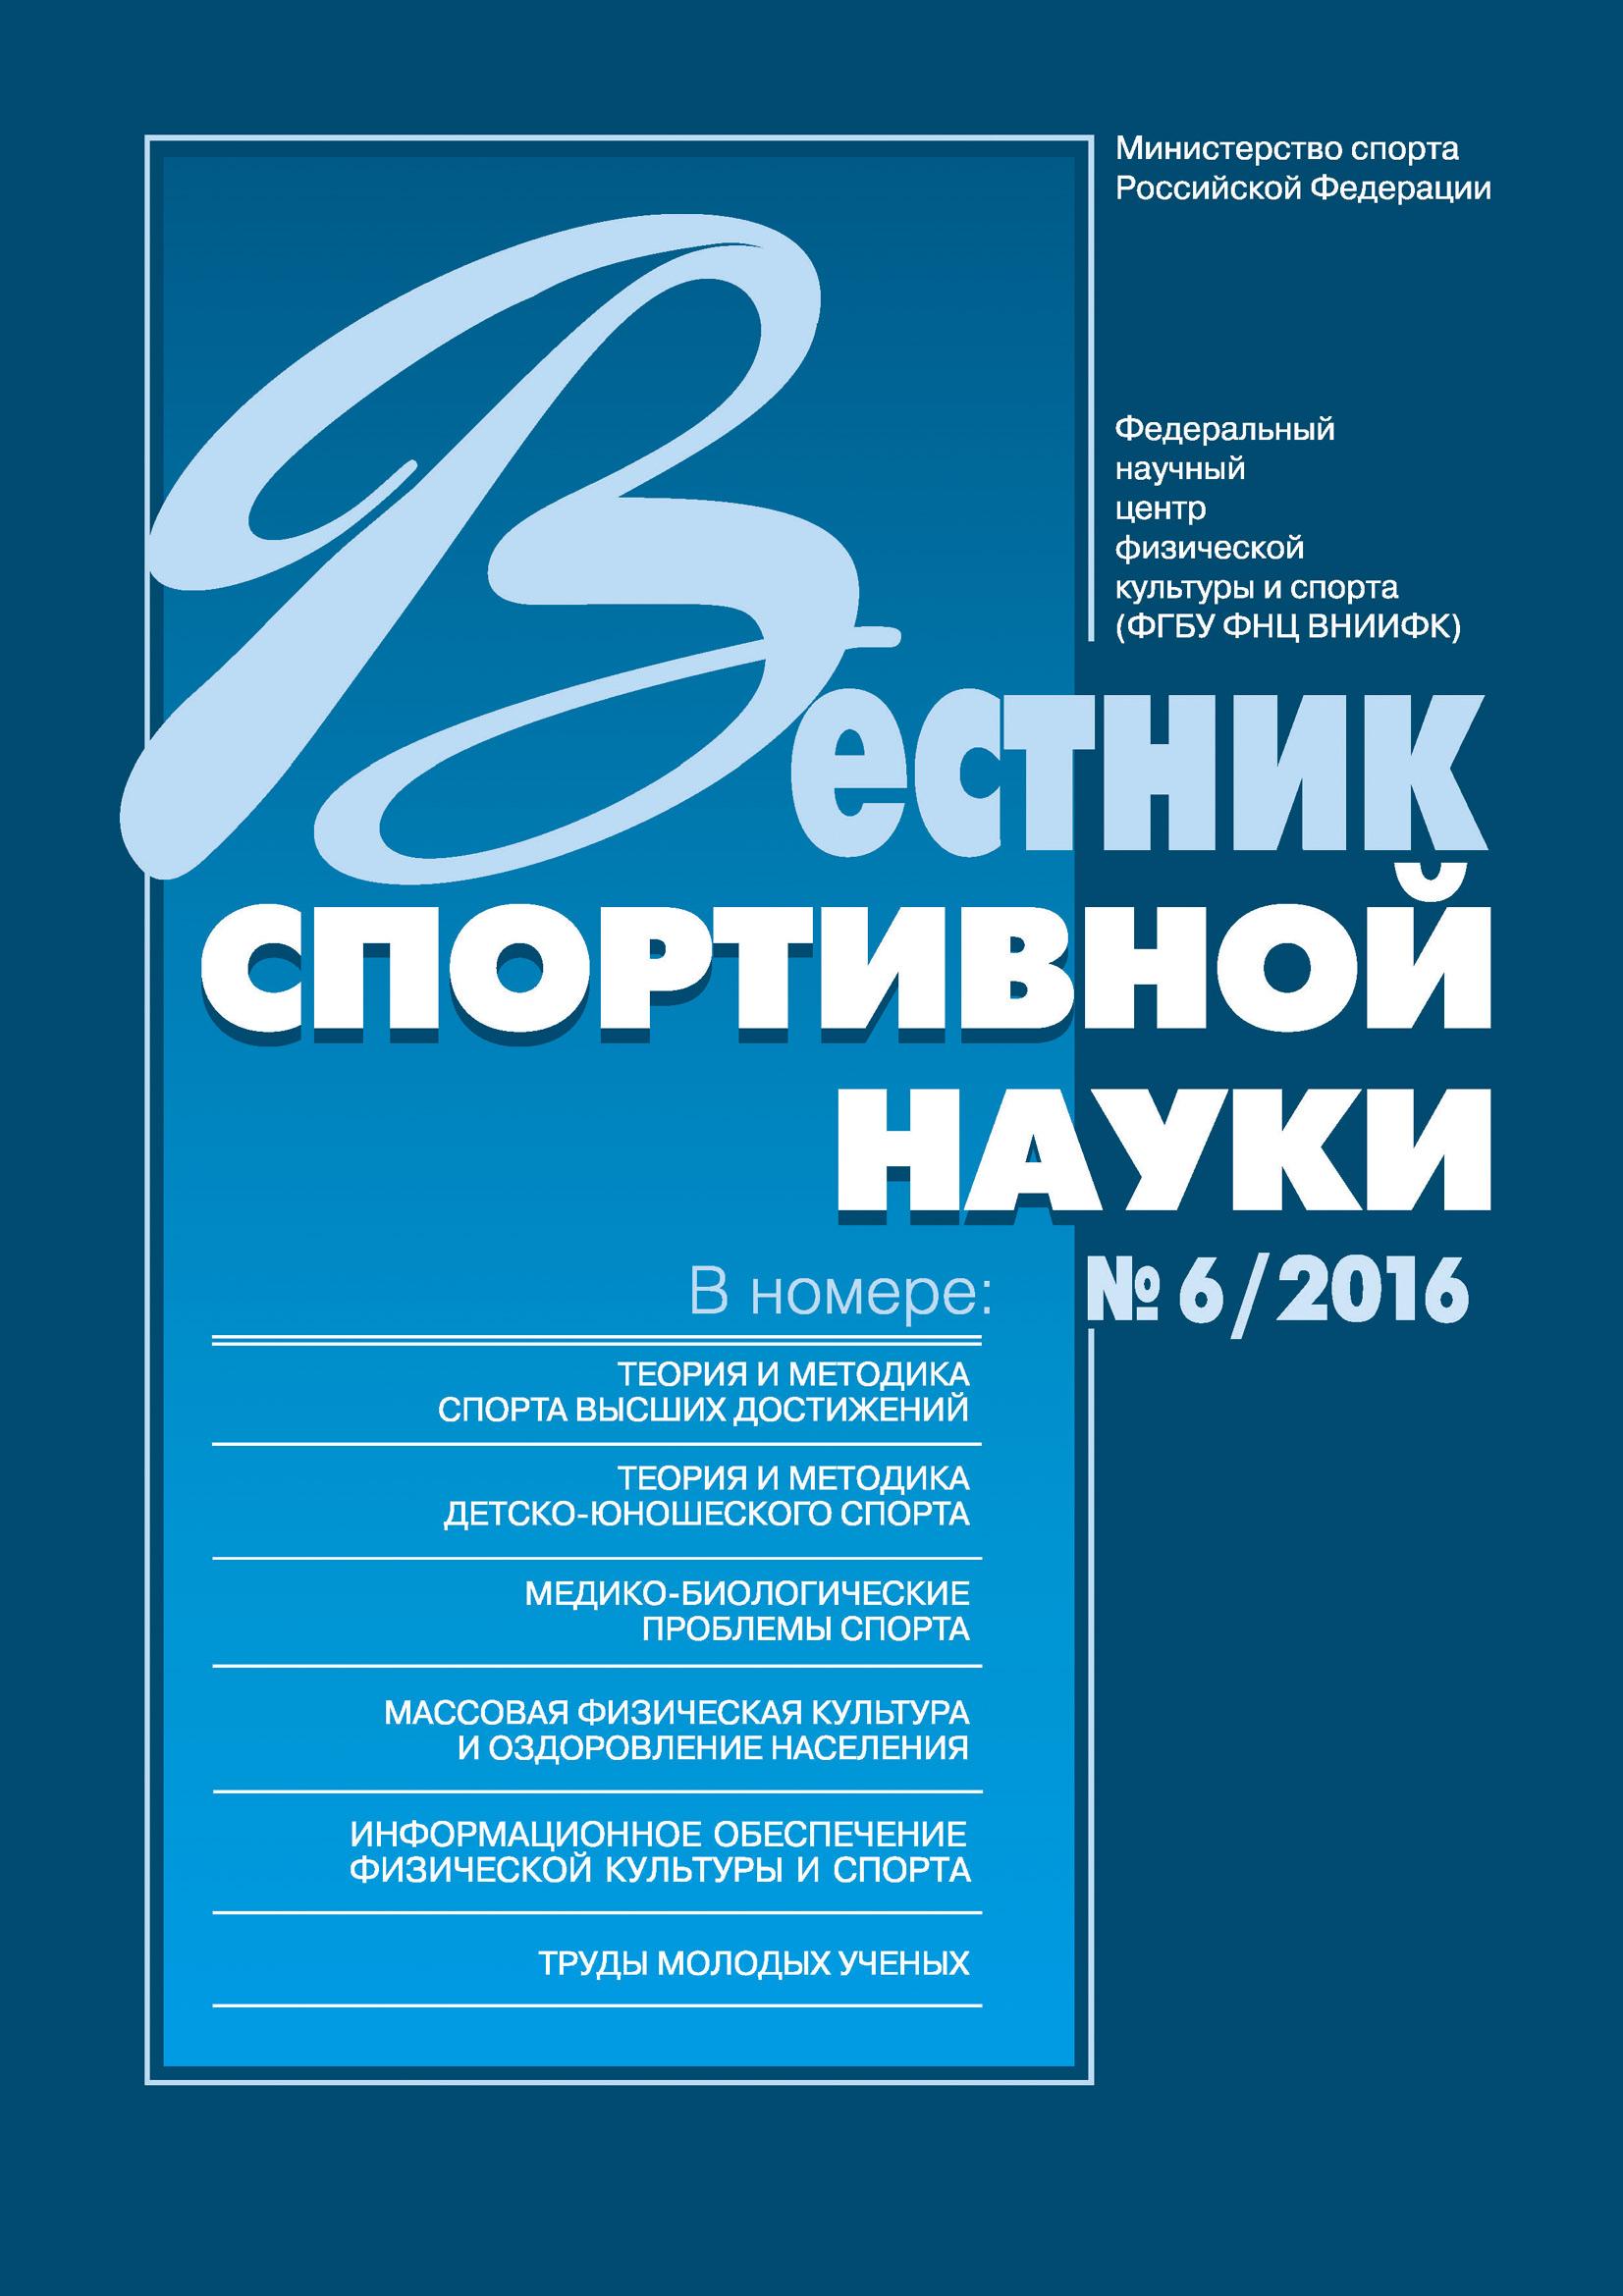 Вестник спортивной науки 6/2016